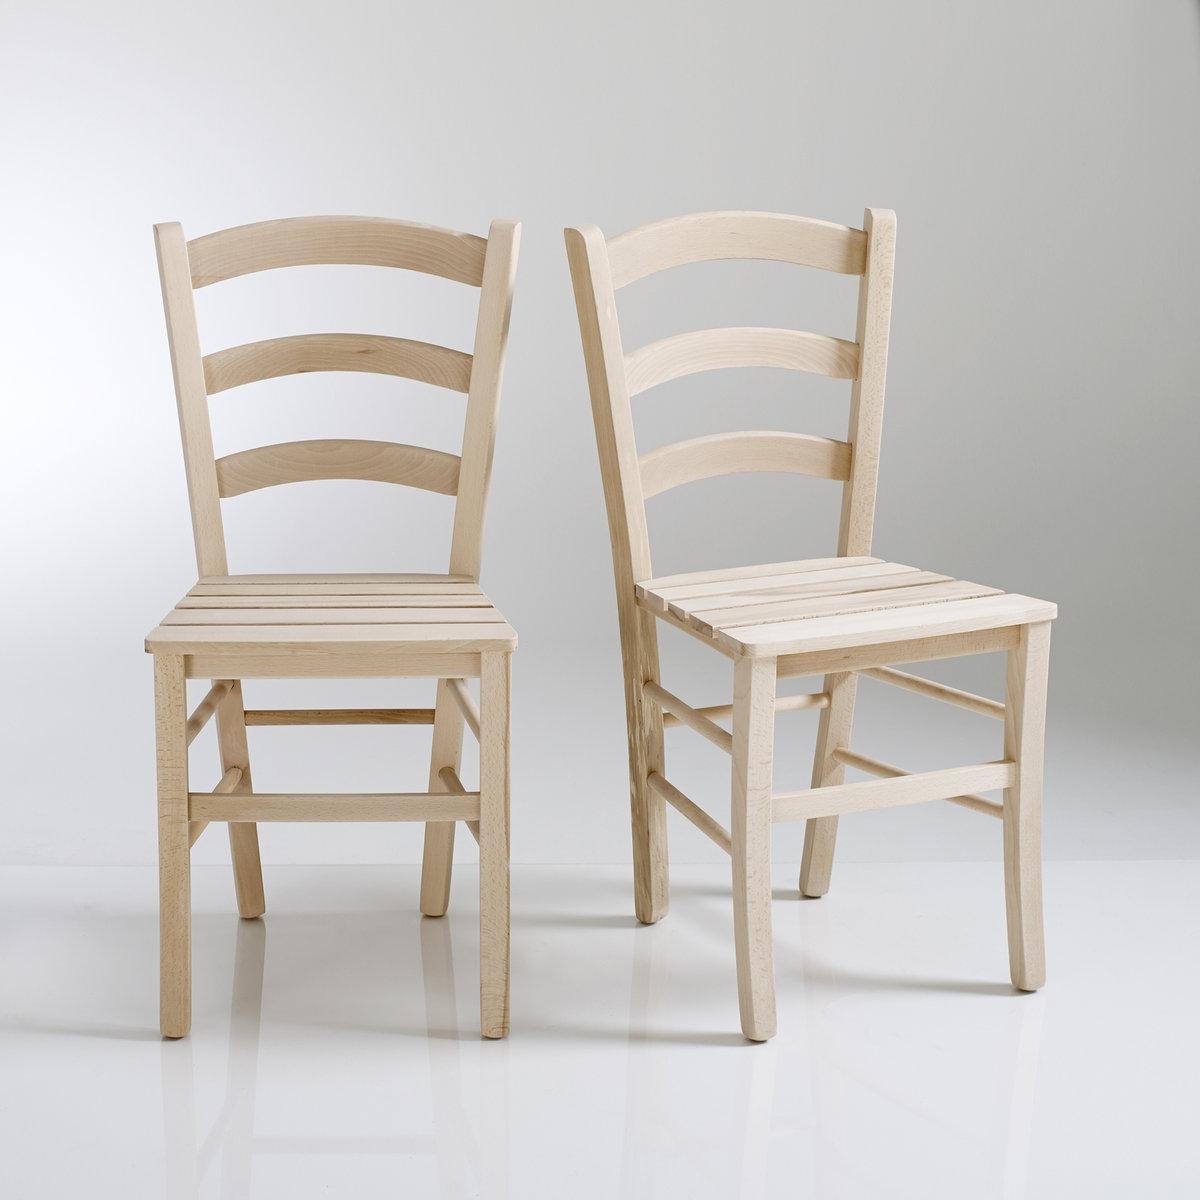 2 стула из досок, Perrine